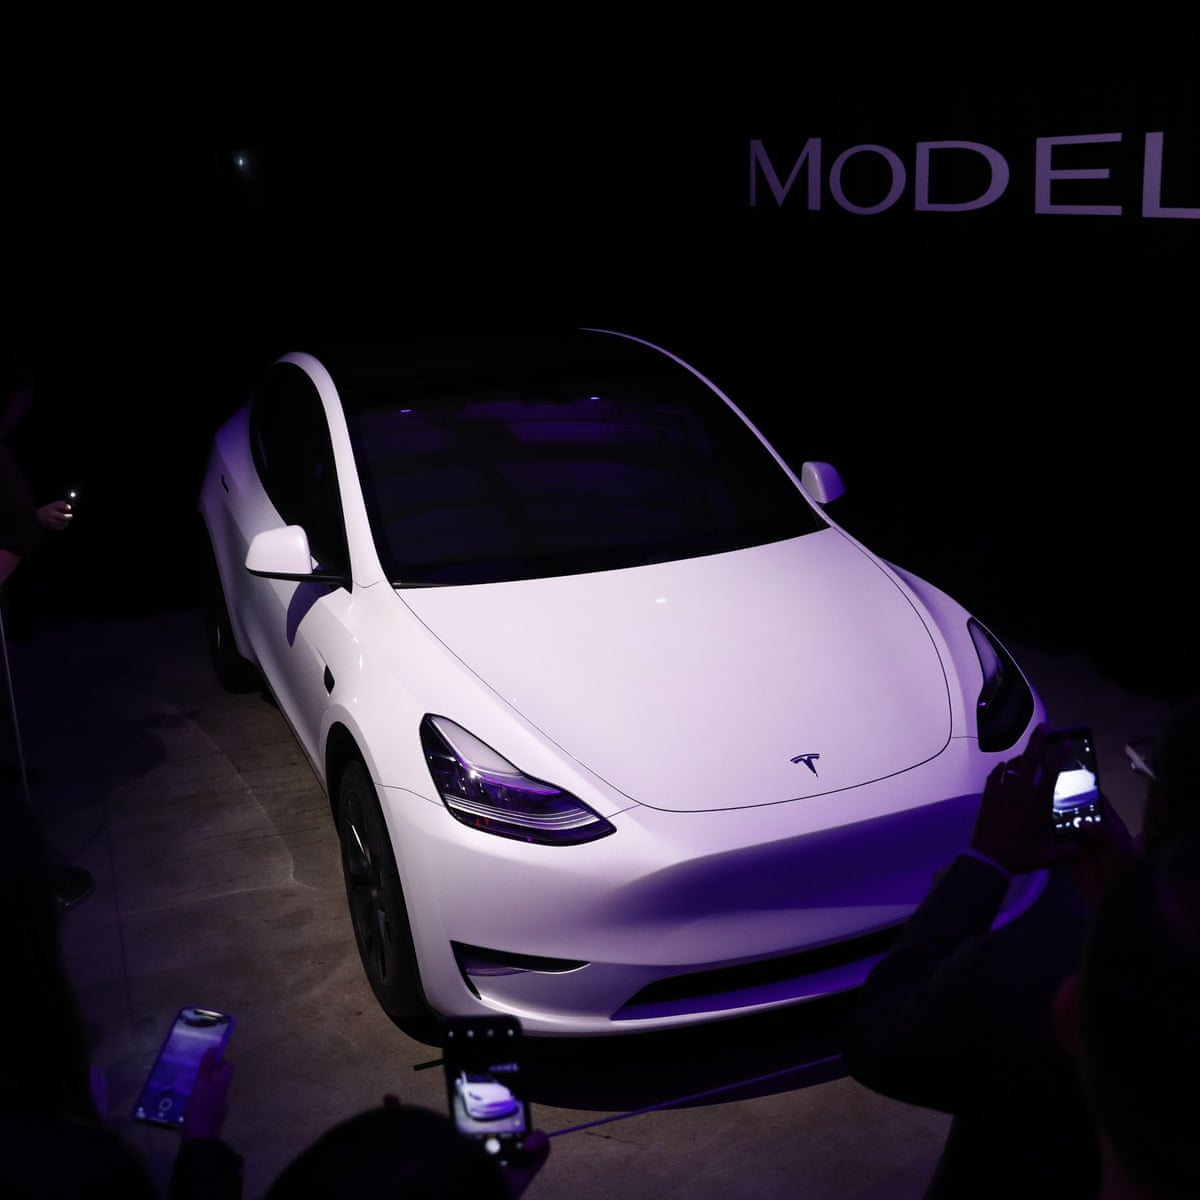 Model Y Tesla Unveils New Electric Crossover Suv Tesla The Guardian